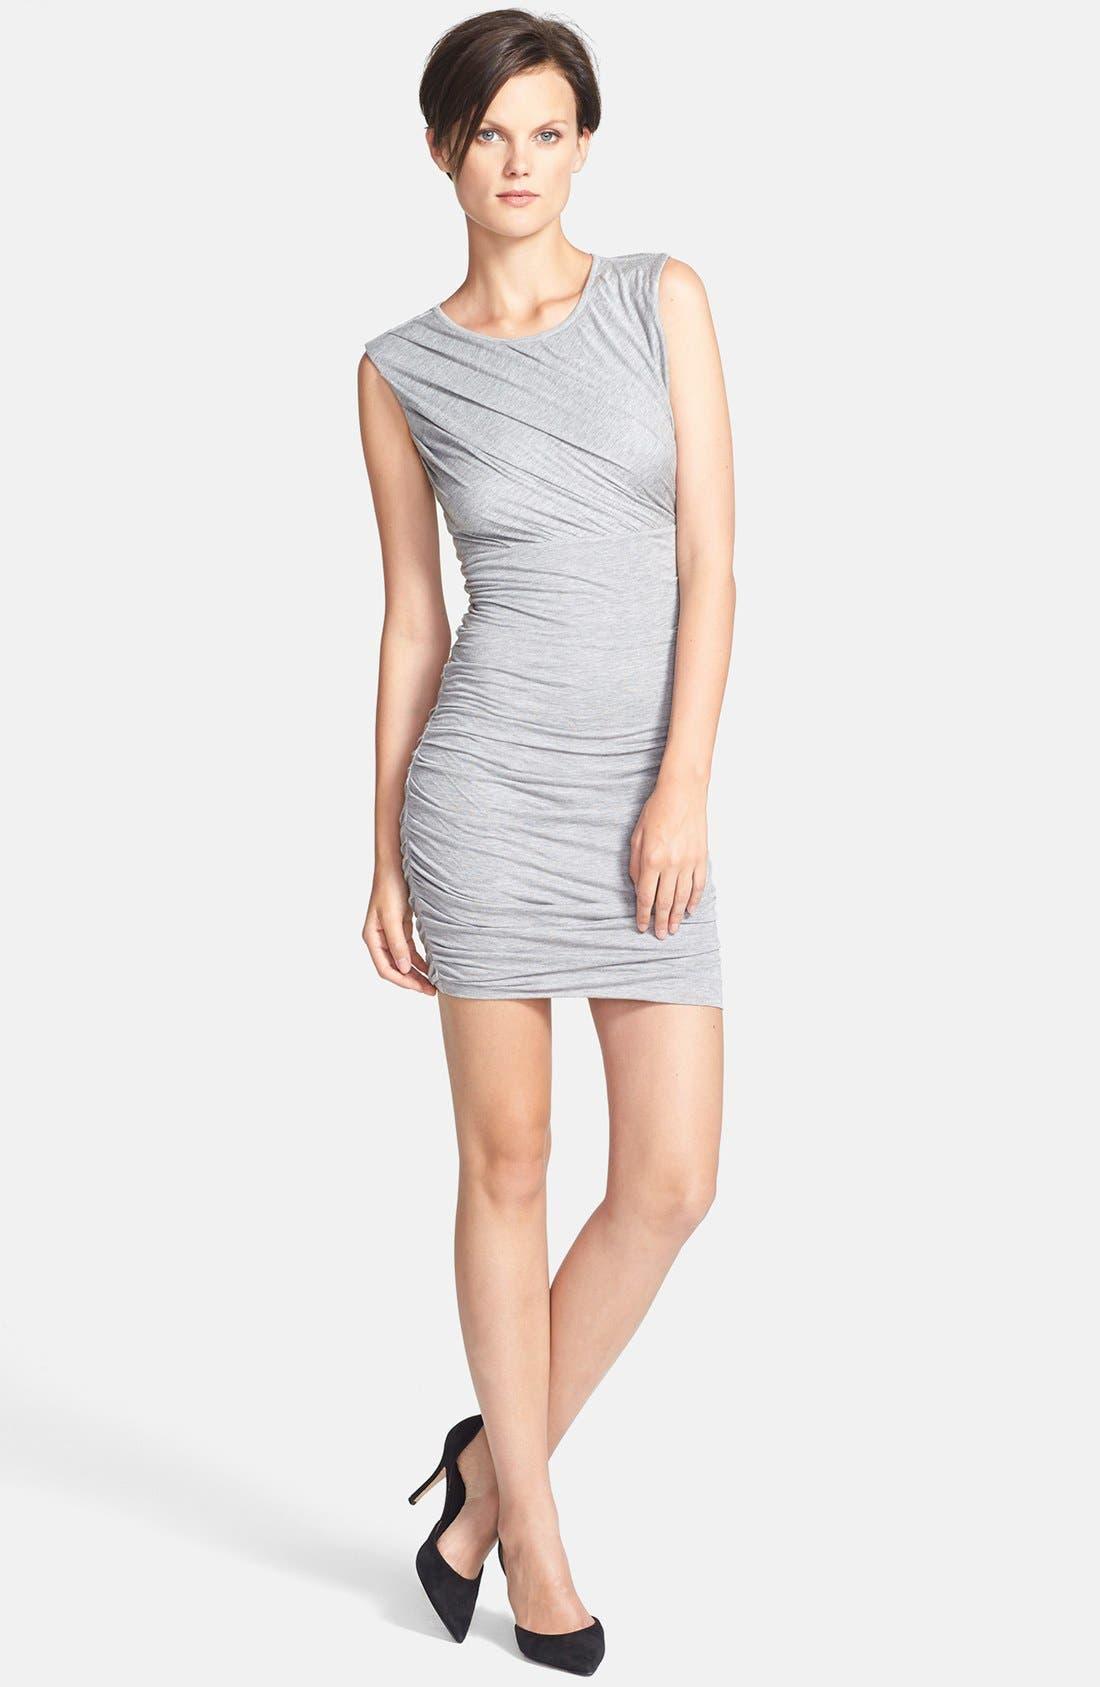 Main Image - Diane von Furstenberg 'Angelina' Ruched Knit Sleeveless Dress